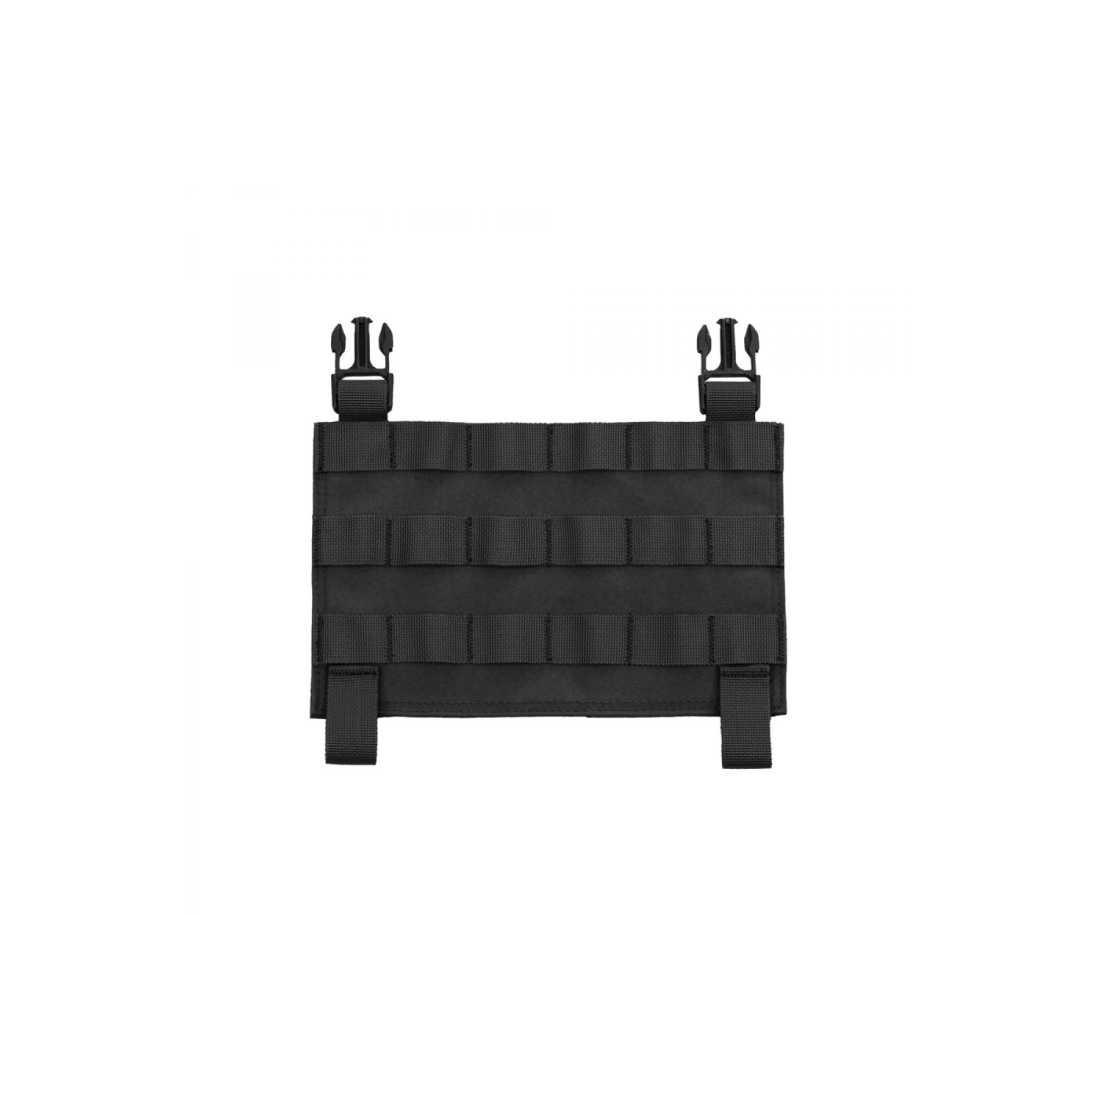 Recon Plate Carrier Vest Molle Front Panel black [Warrior]